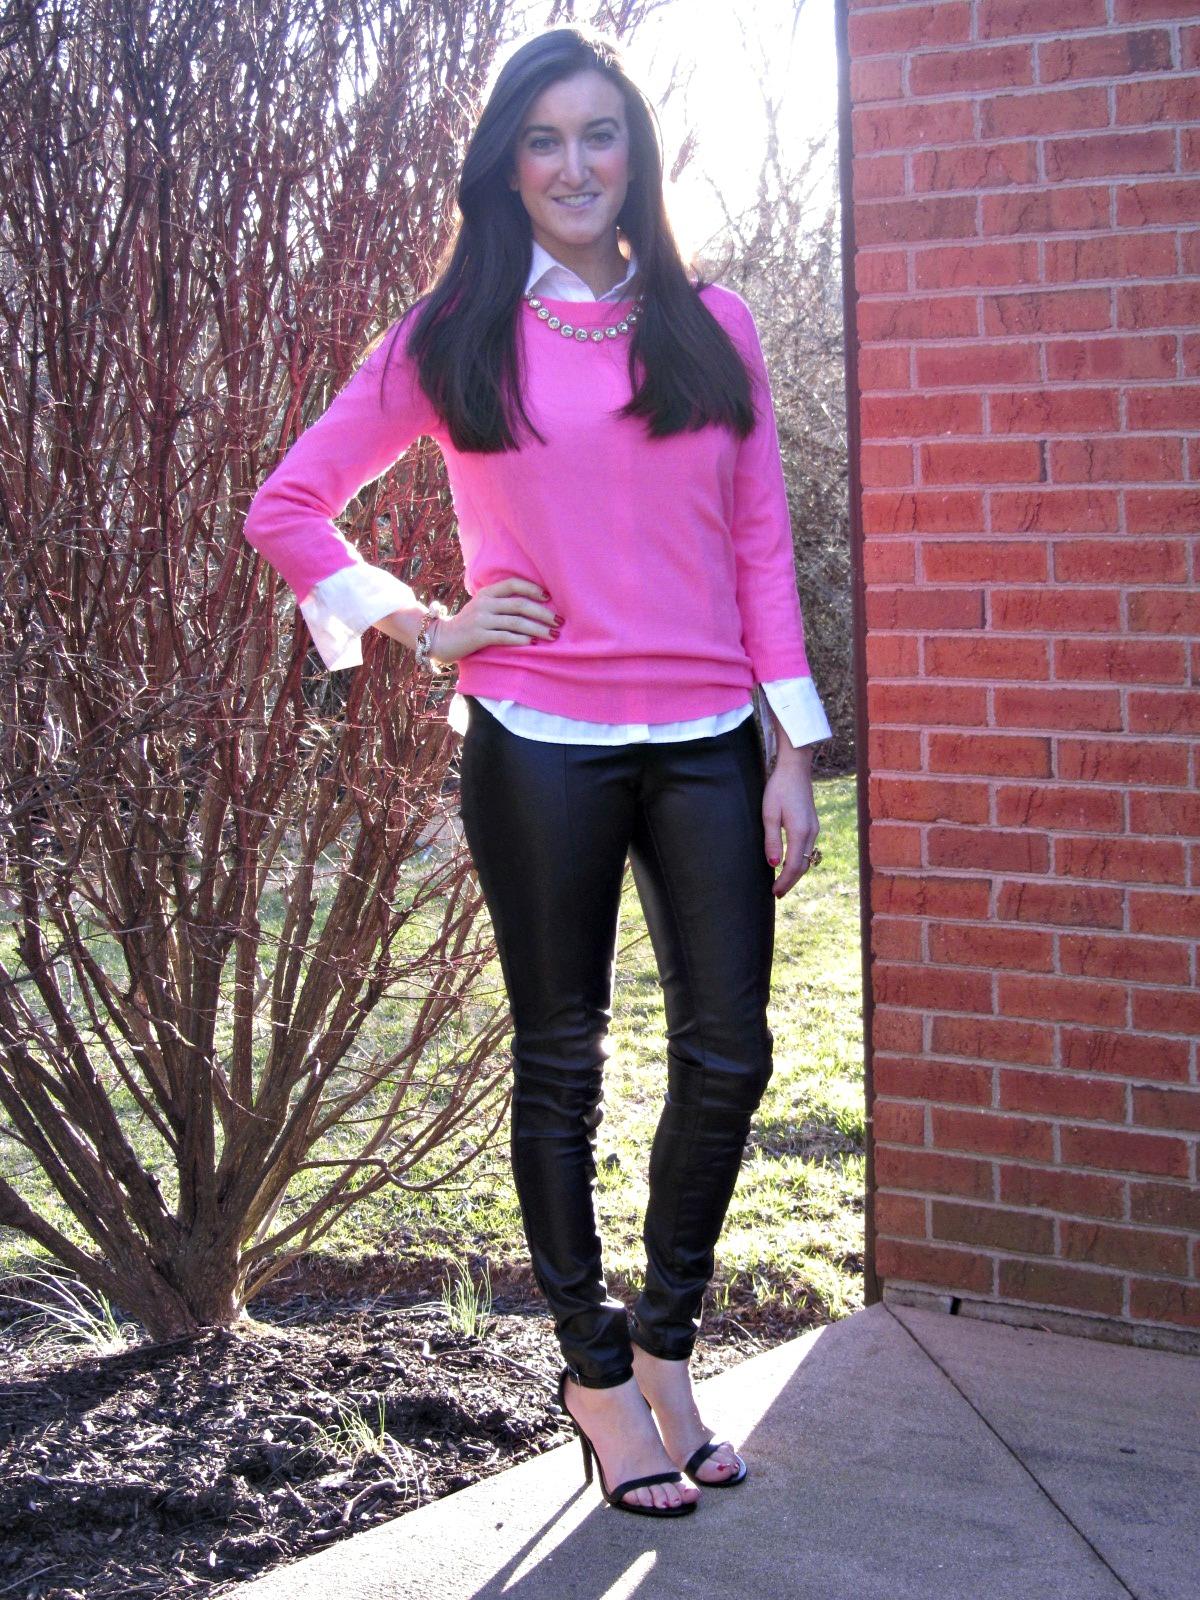 H&m Leather Pants J.crew Pink